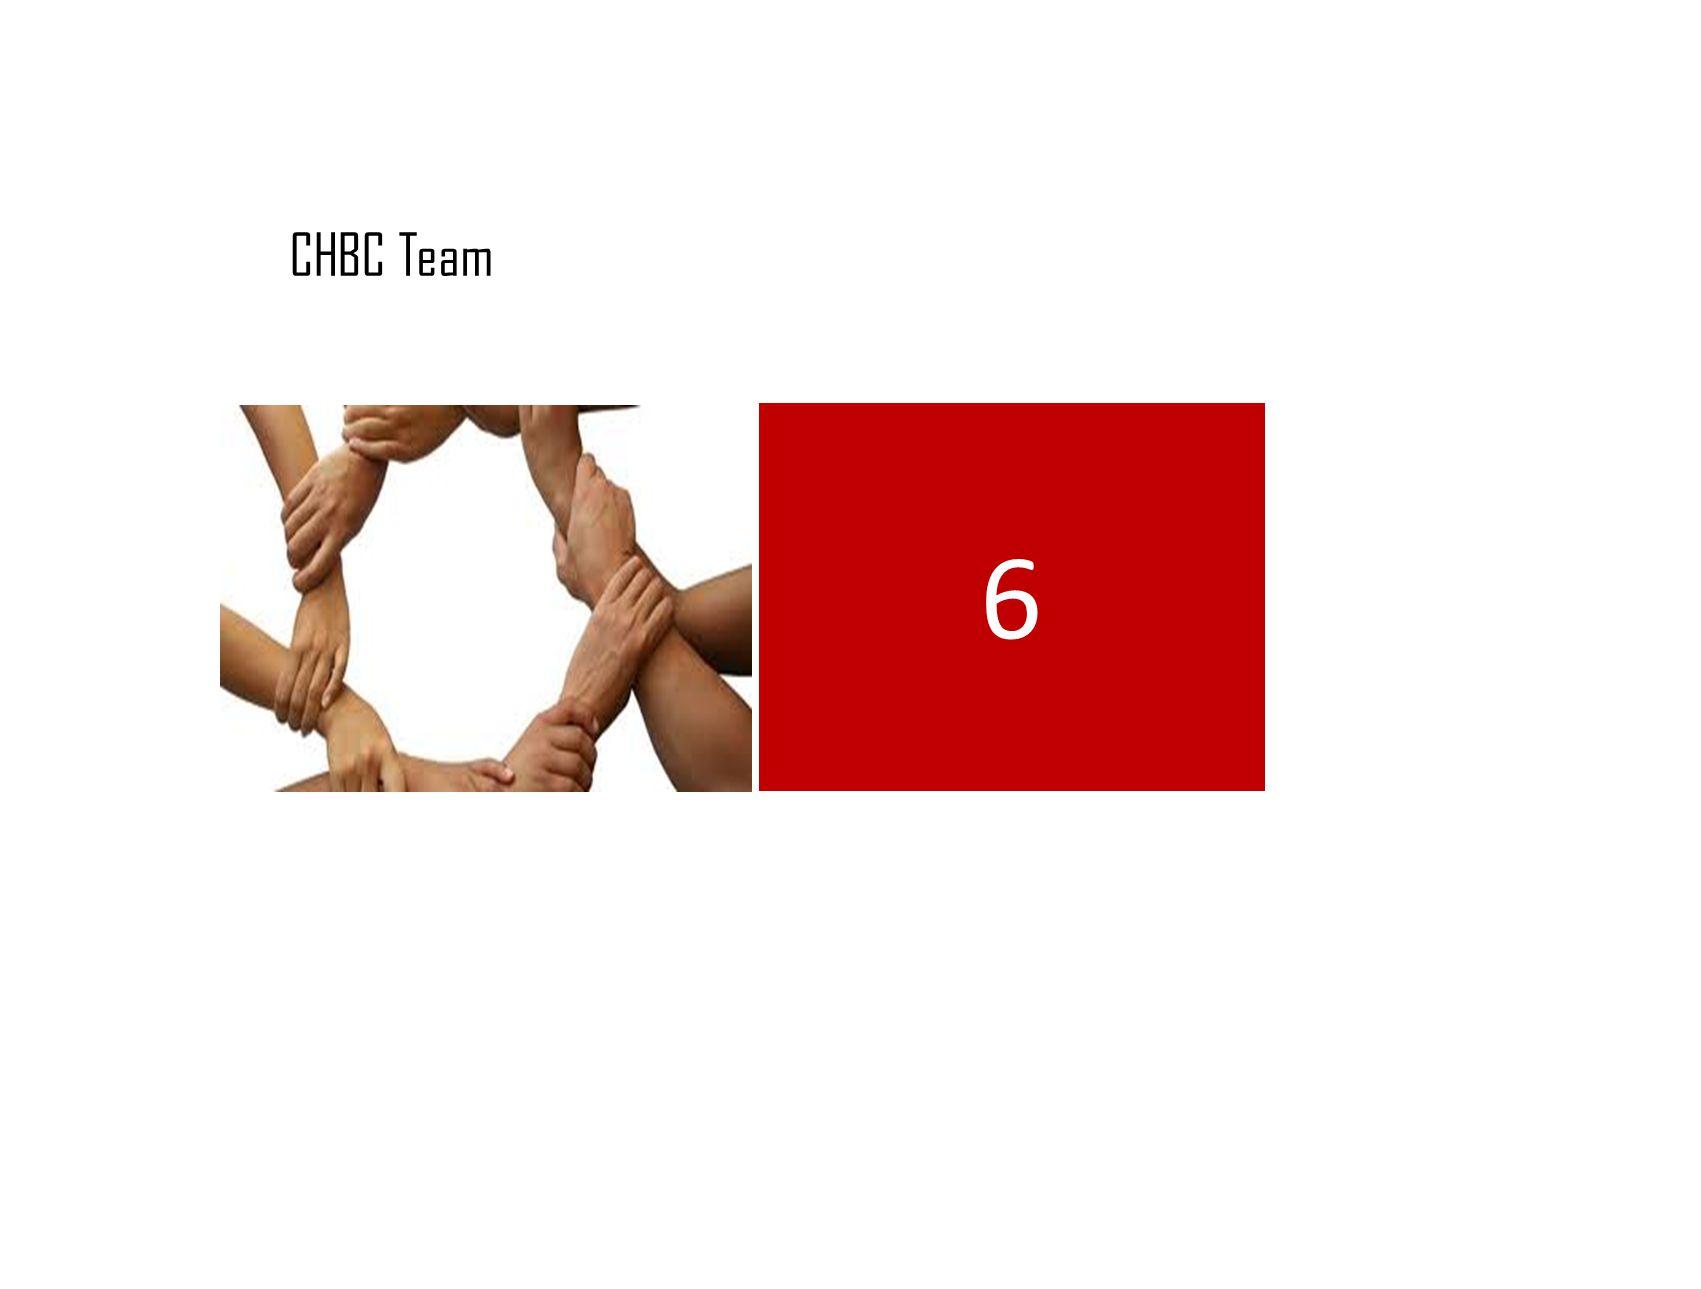 CHBC Team 6